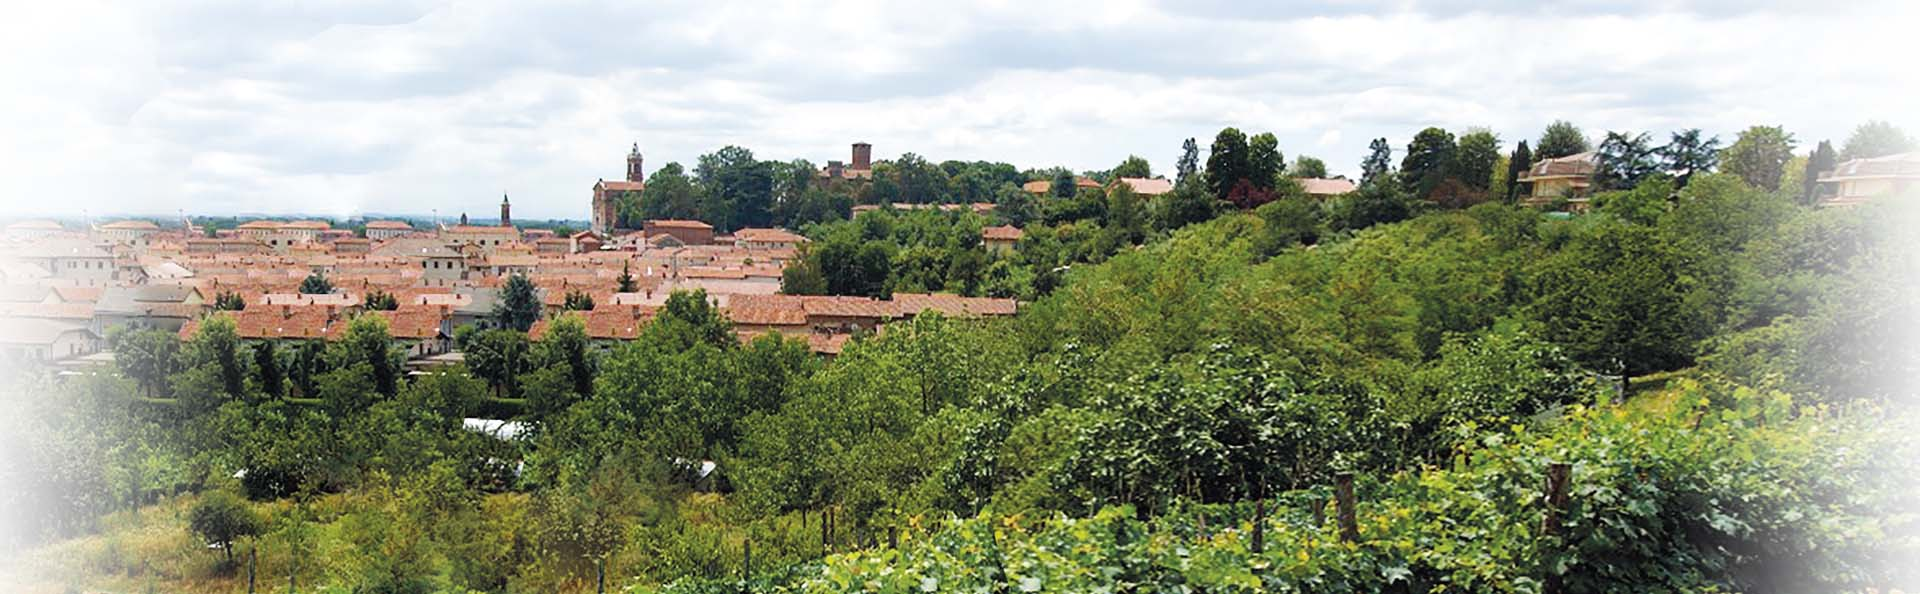 Bonino-macchine-agricole-Sommariva-Bosco-Cuneo-machines-agricoles-Piémont-Italie